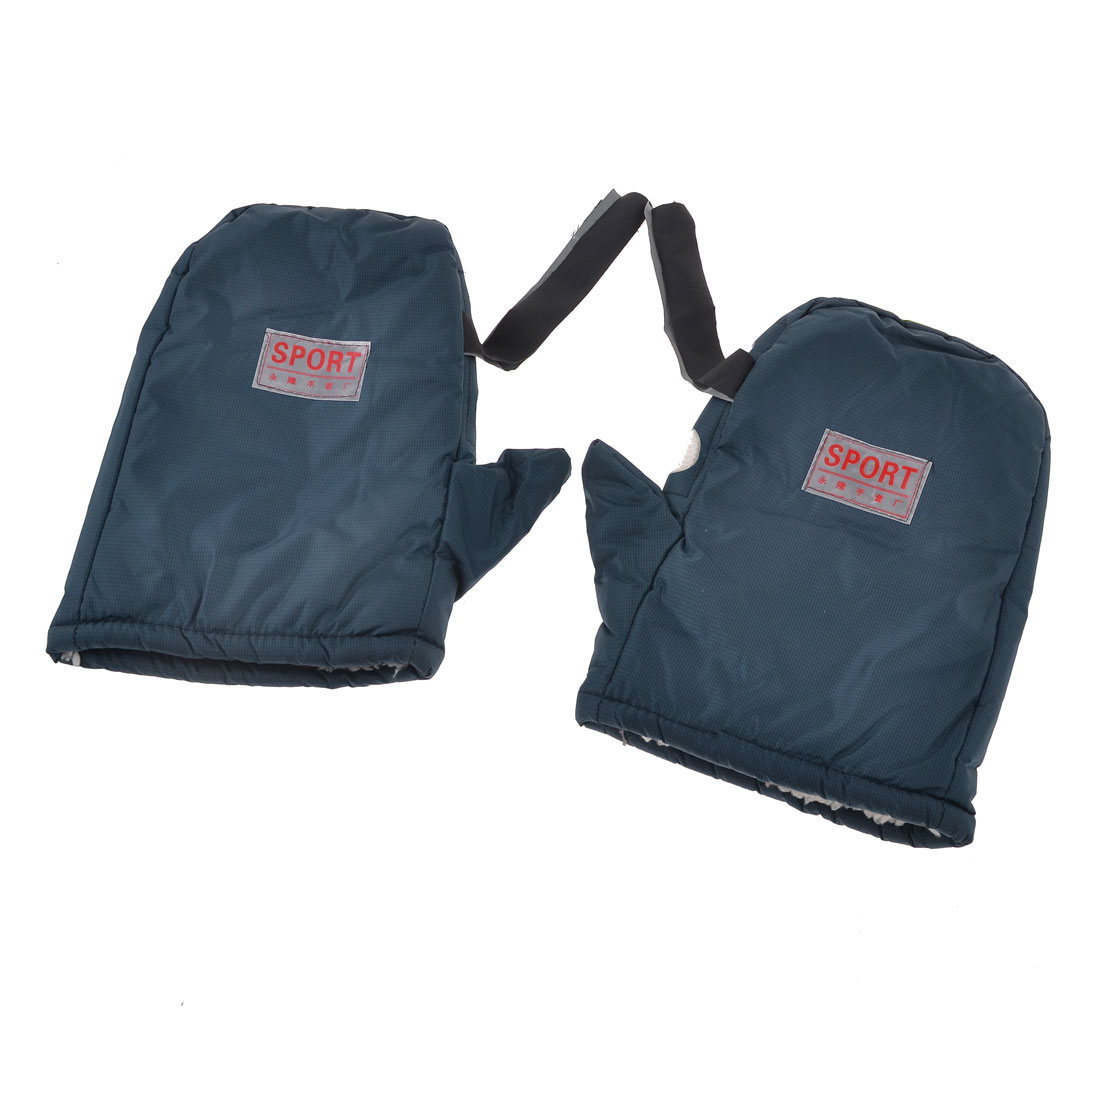 Man Warmer Mini Grids Print Plush Lining Navy Blue Sports Mitten Gloves Pair